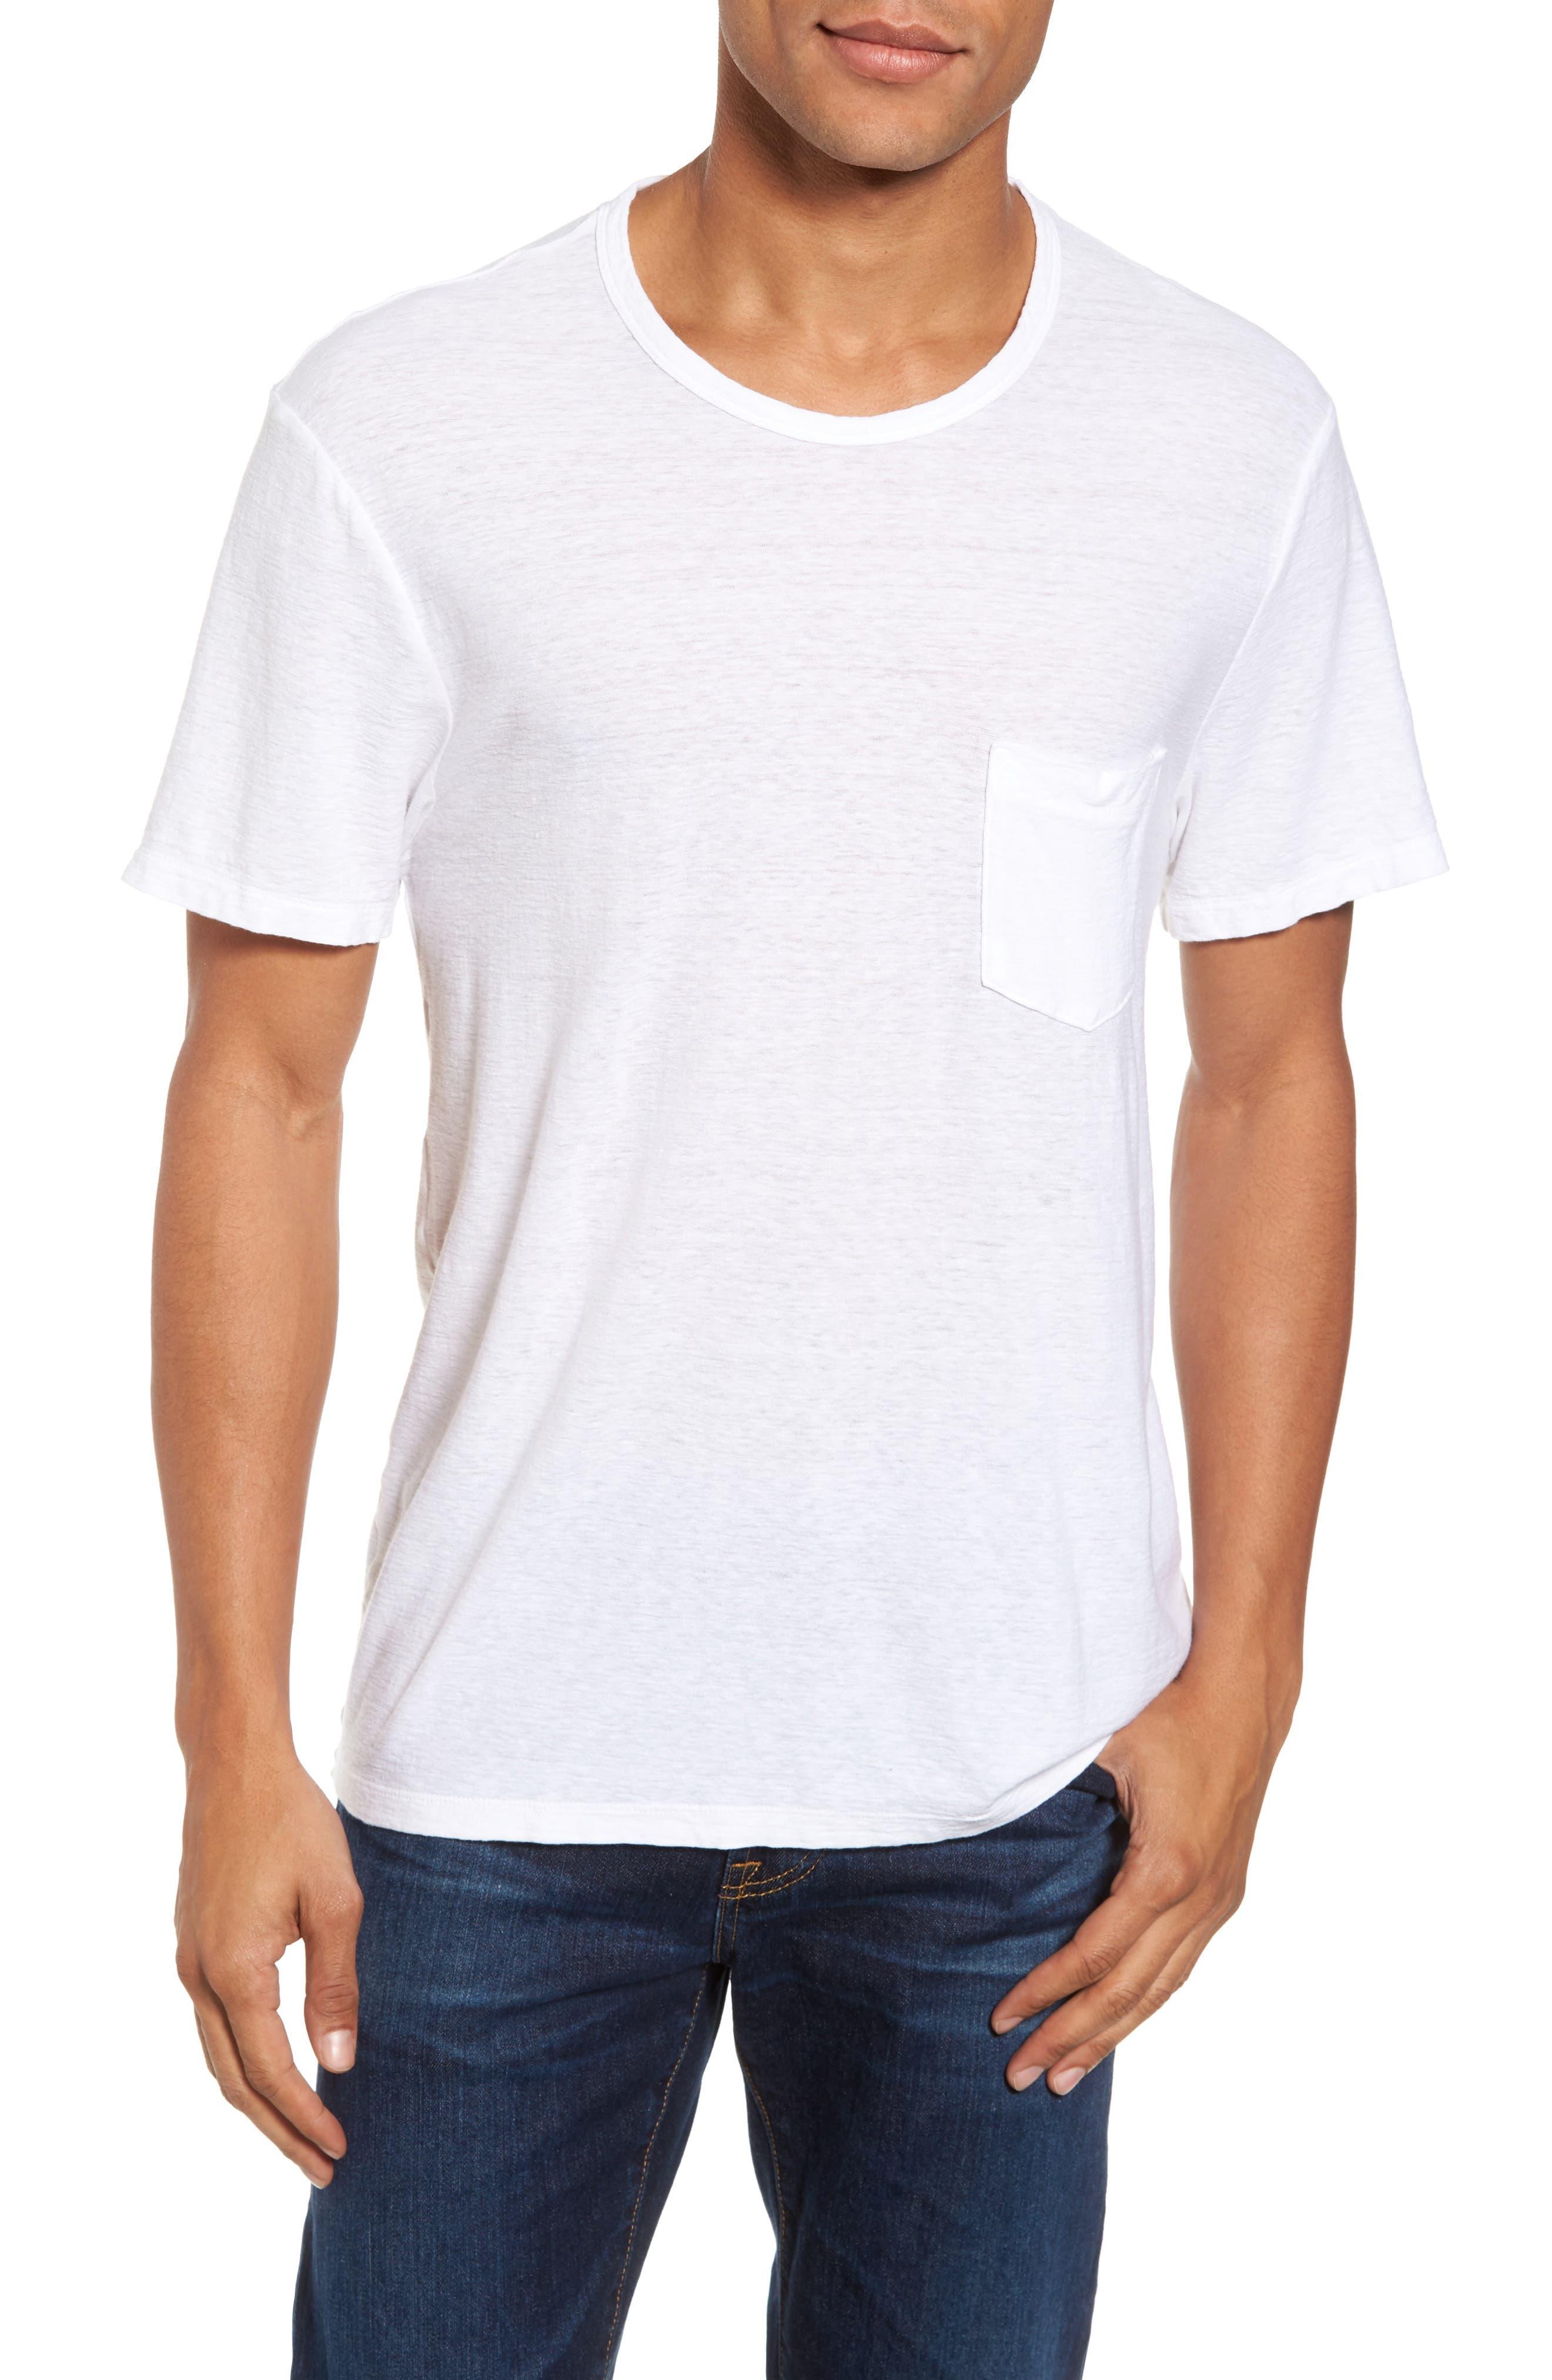 Alternate Image 1 Selected - James Perse Cotton & Linen Pocket T-Shirt